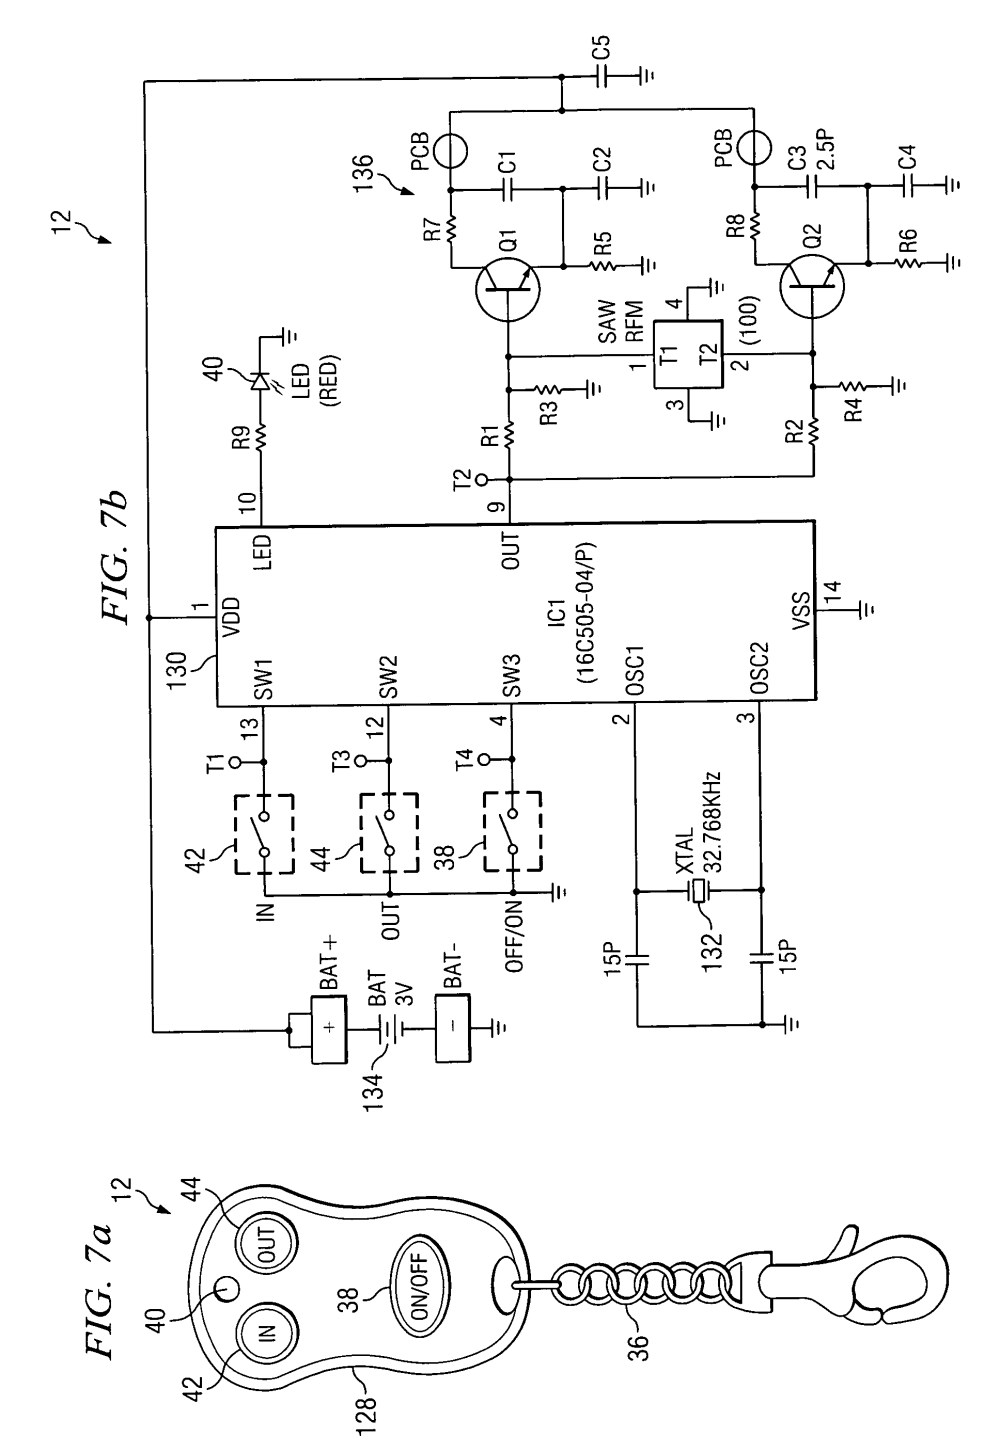 medium resolution of remote winch control wiring diagram wiring diagram badlandremote winch control wiring diagram wiring diagram u2013